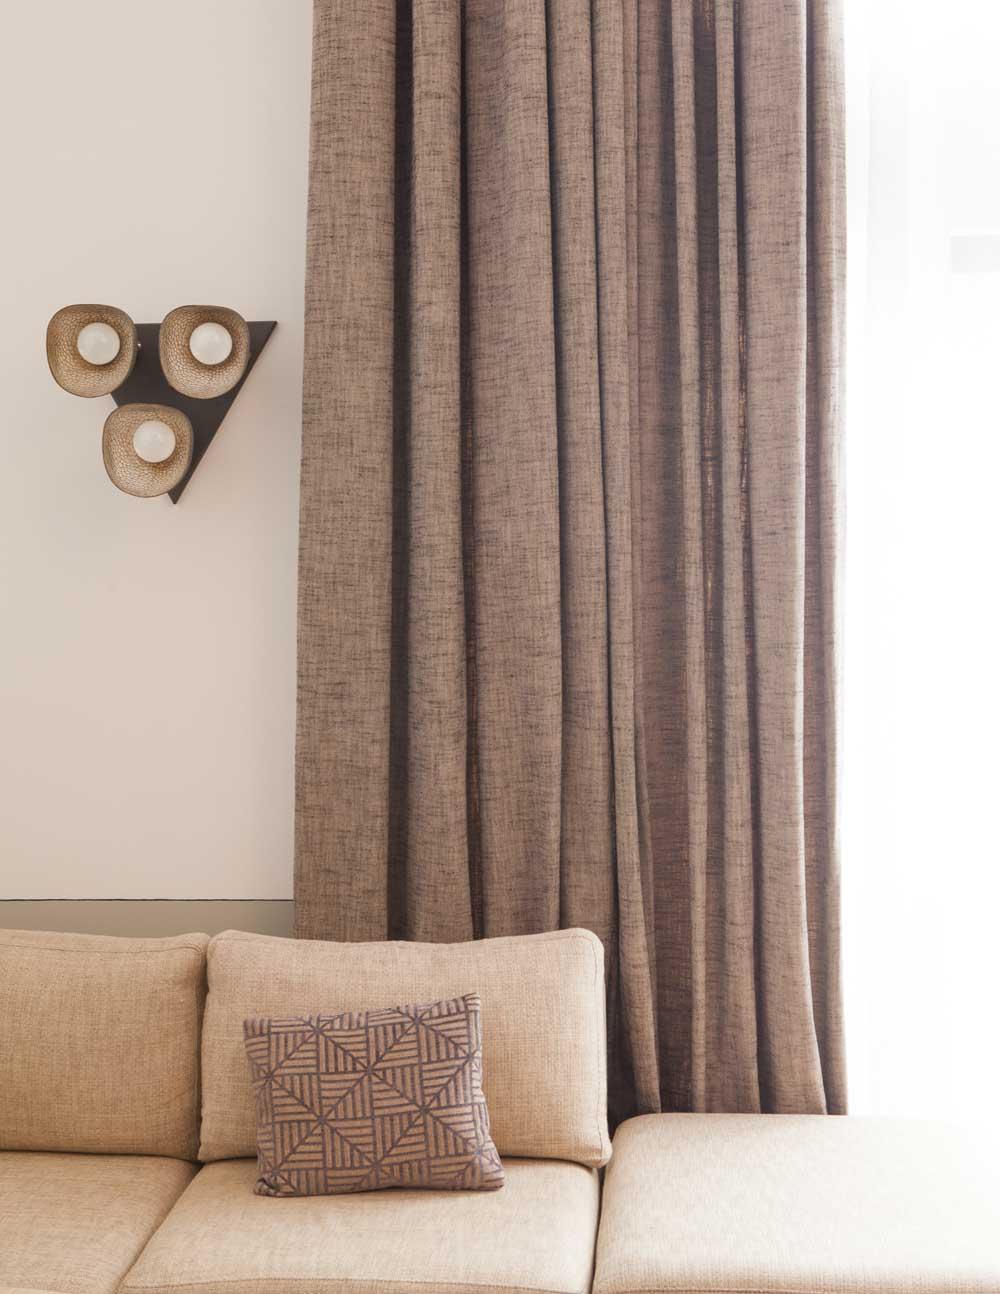 Geremia-Design-Textile